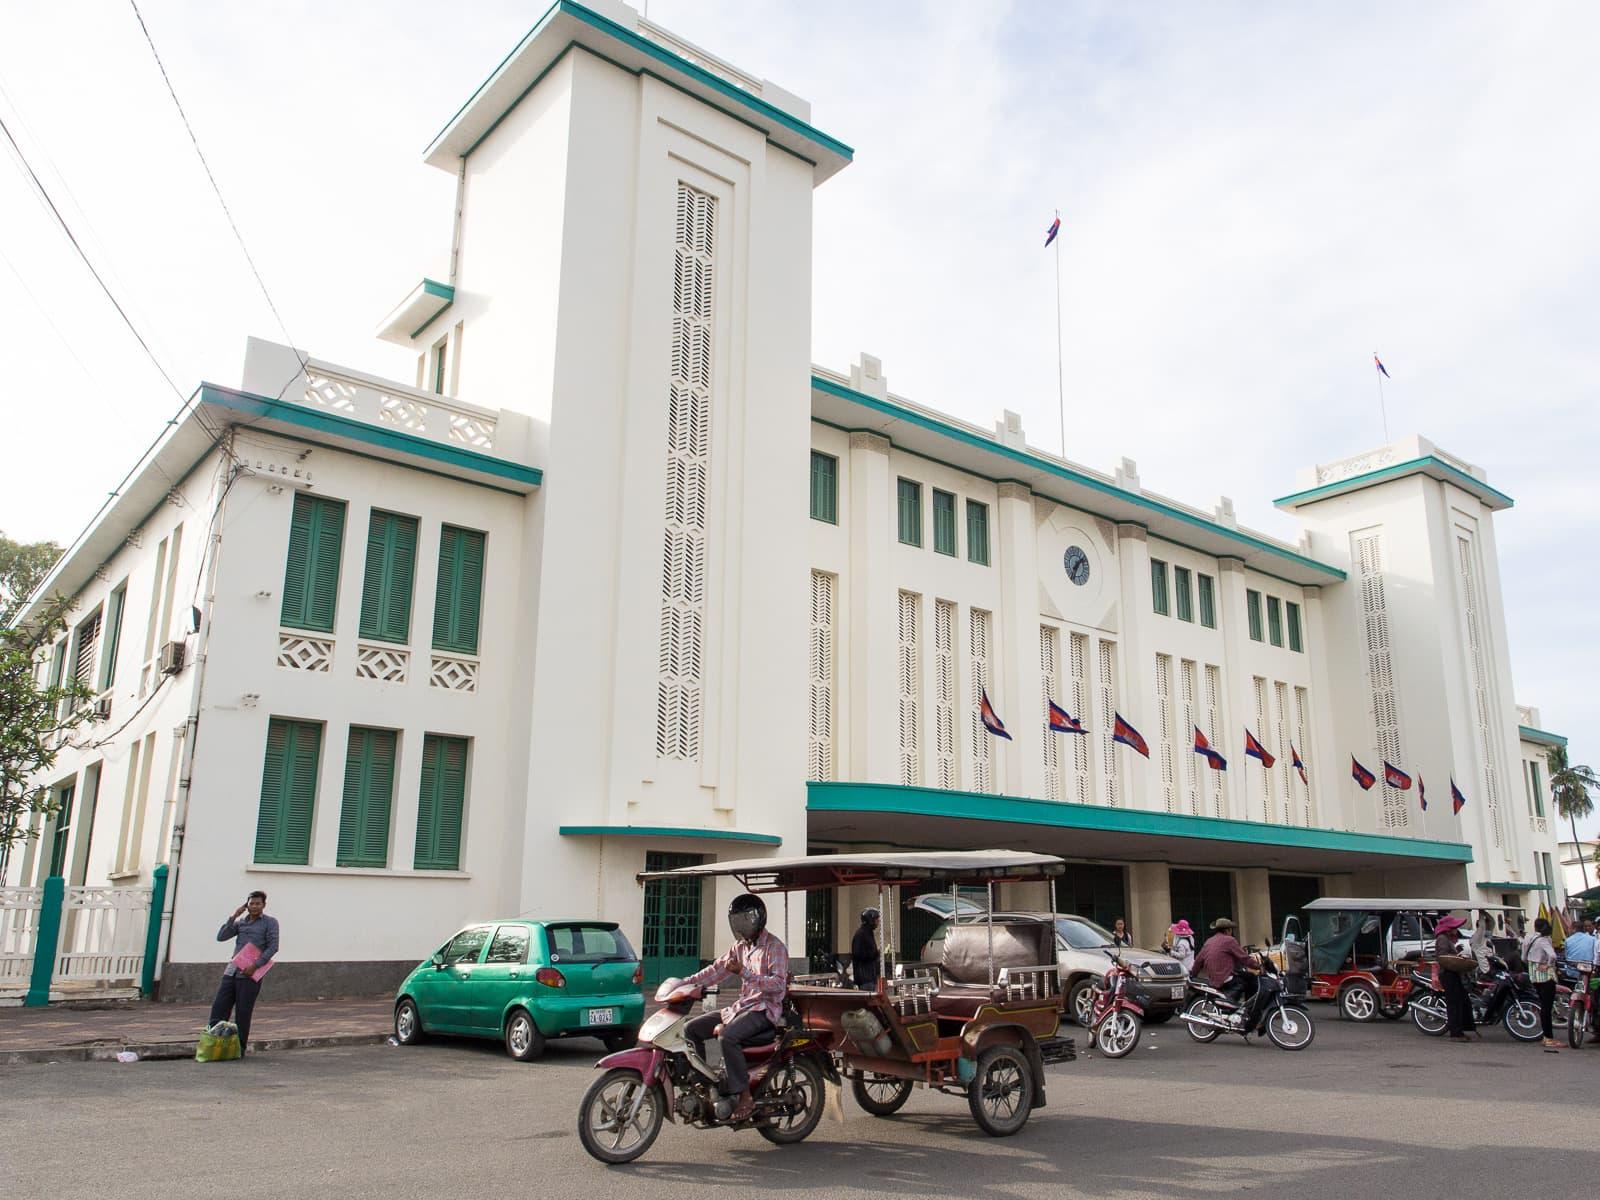 Art Deco train station in Phnom Penh